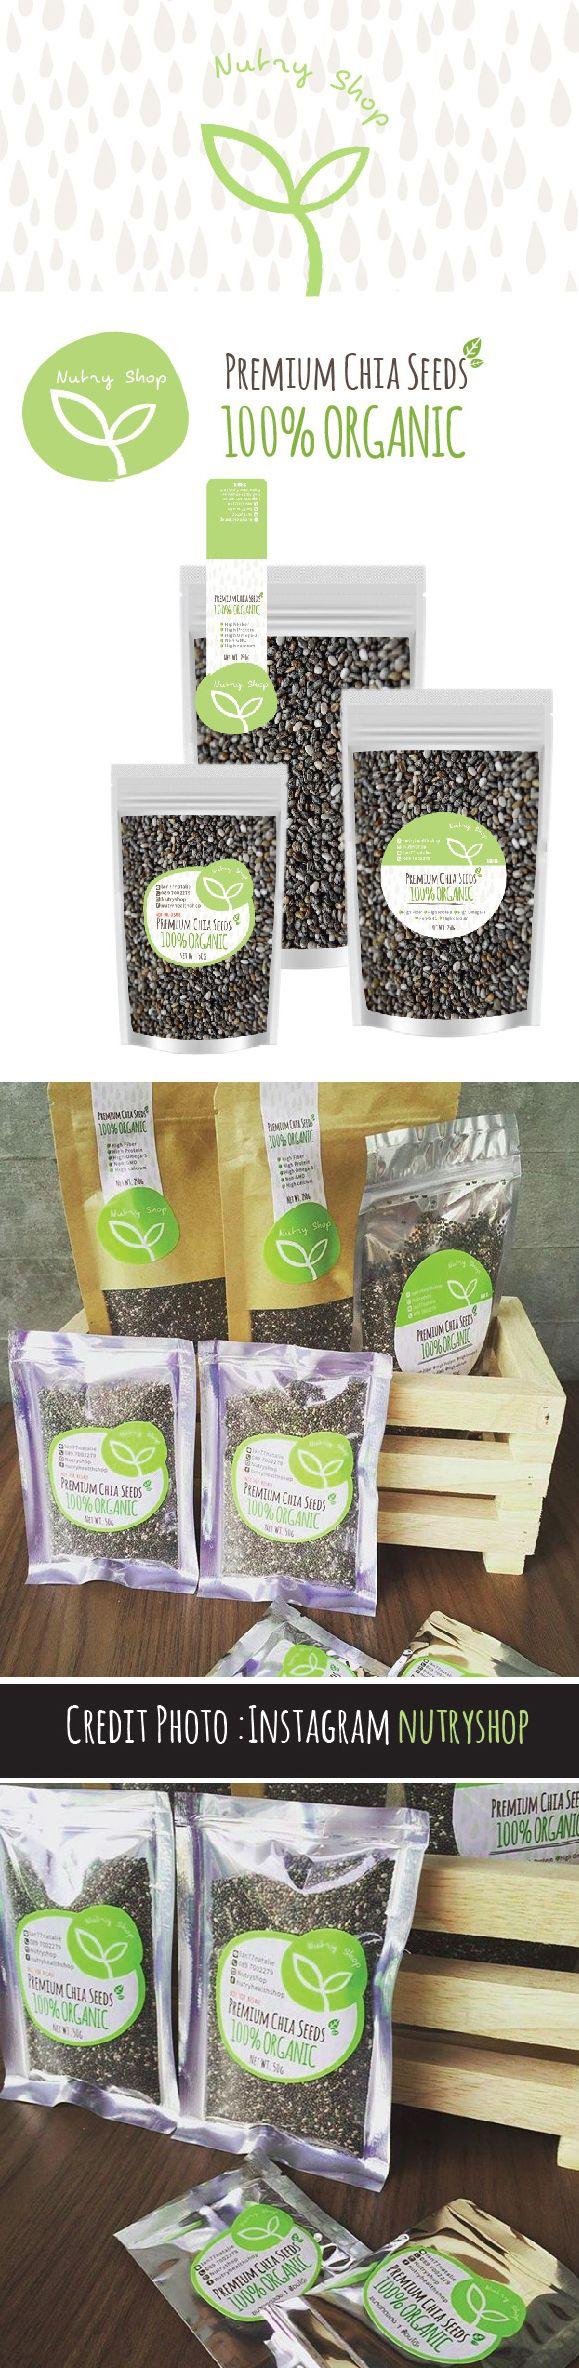 Premium Chia Seeds 100% ORGANIC credit photo: IG @Nutryshop #sticker #label #chiaseeds #organic